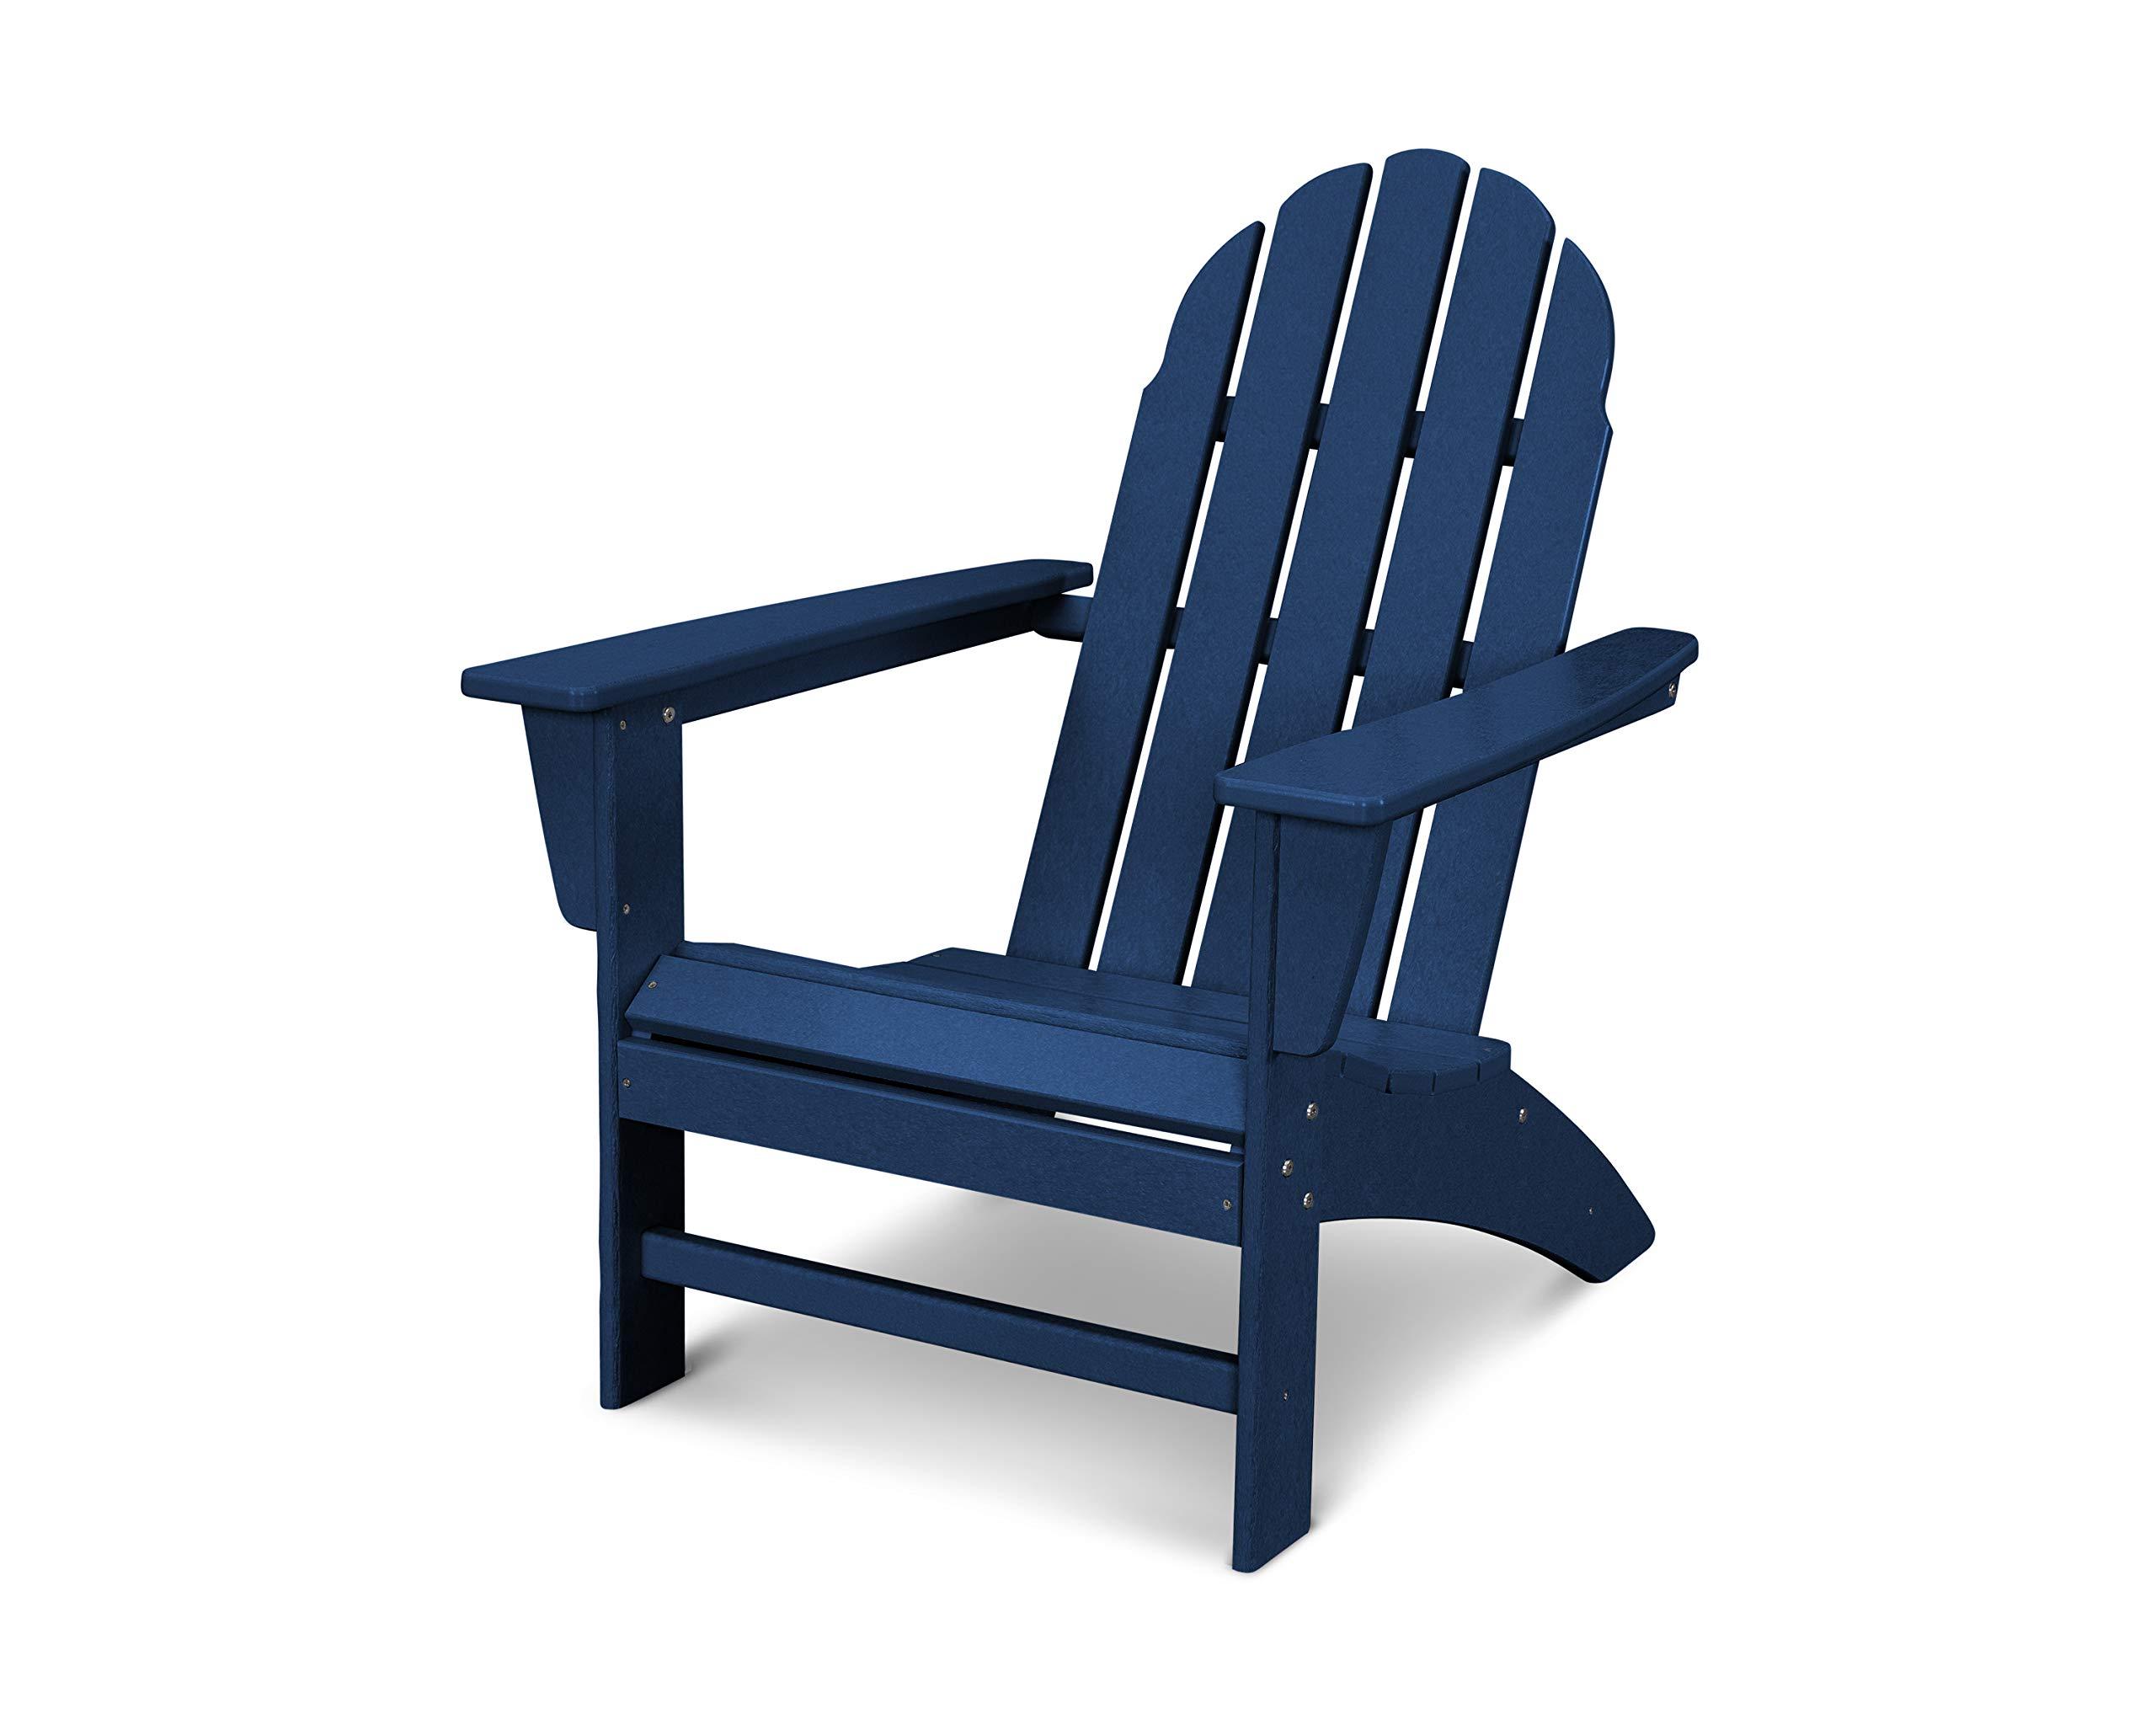 POLYWOOD Vineyard Adirondack Chair, Navy by POLYWOOD